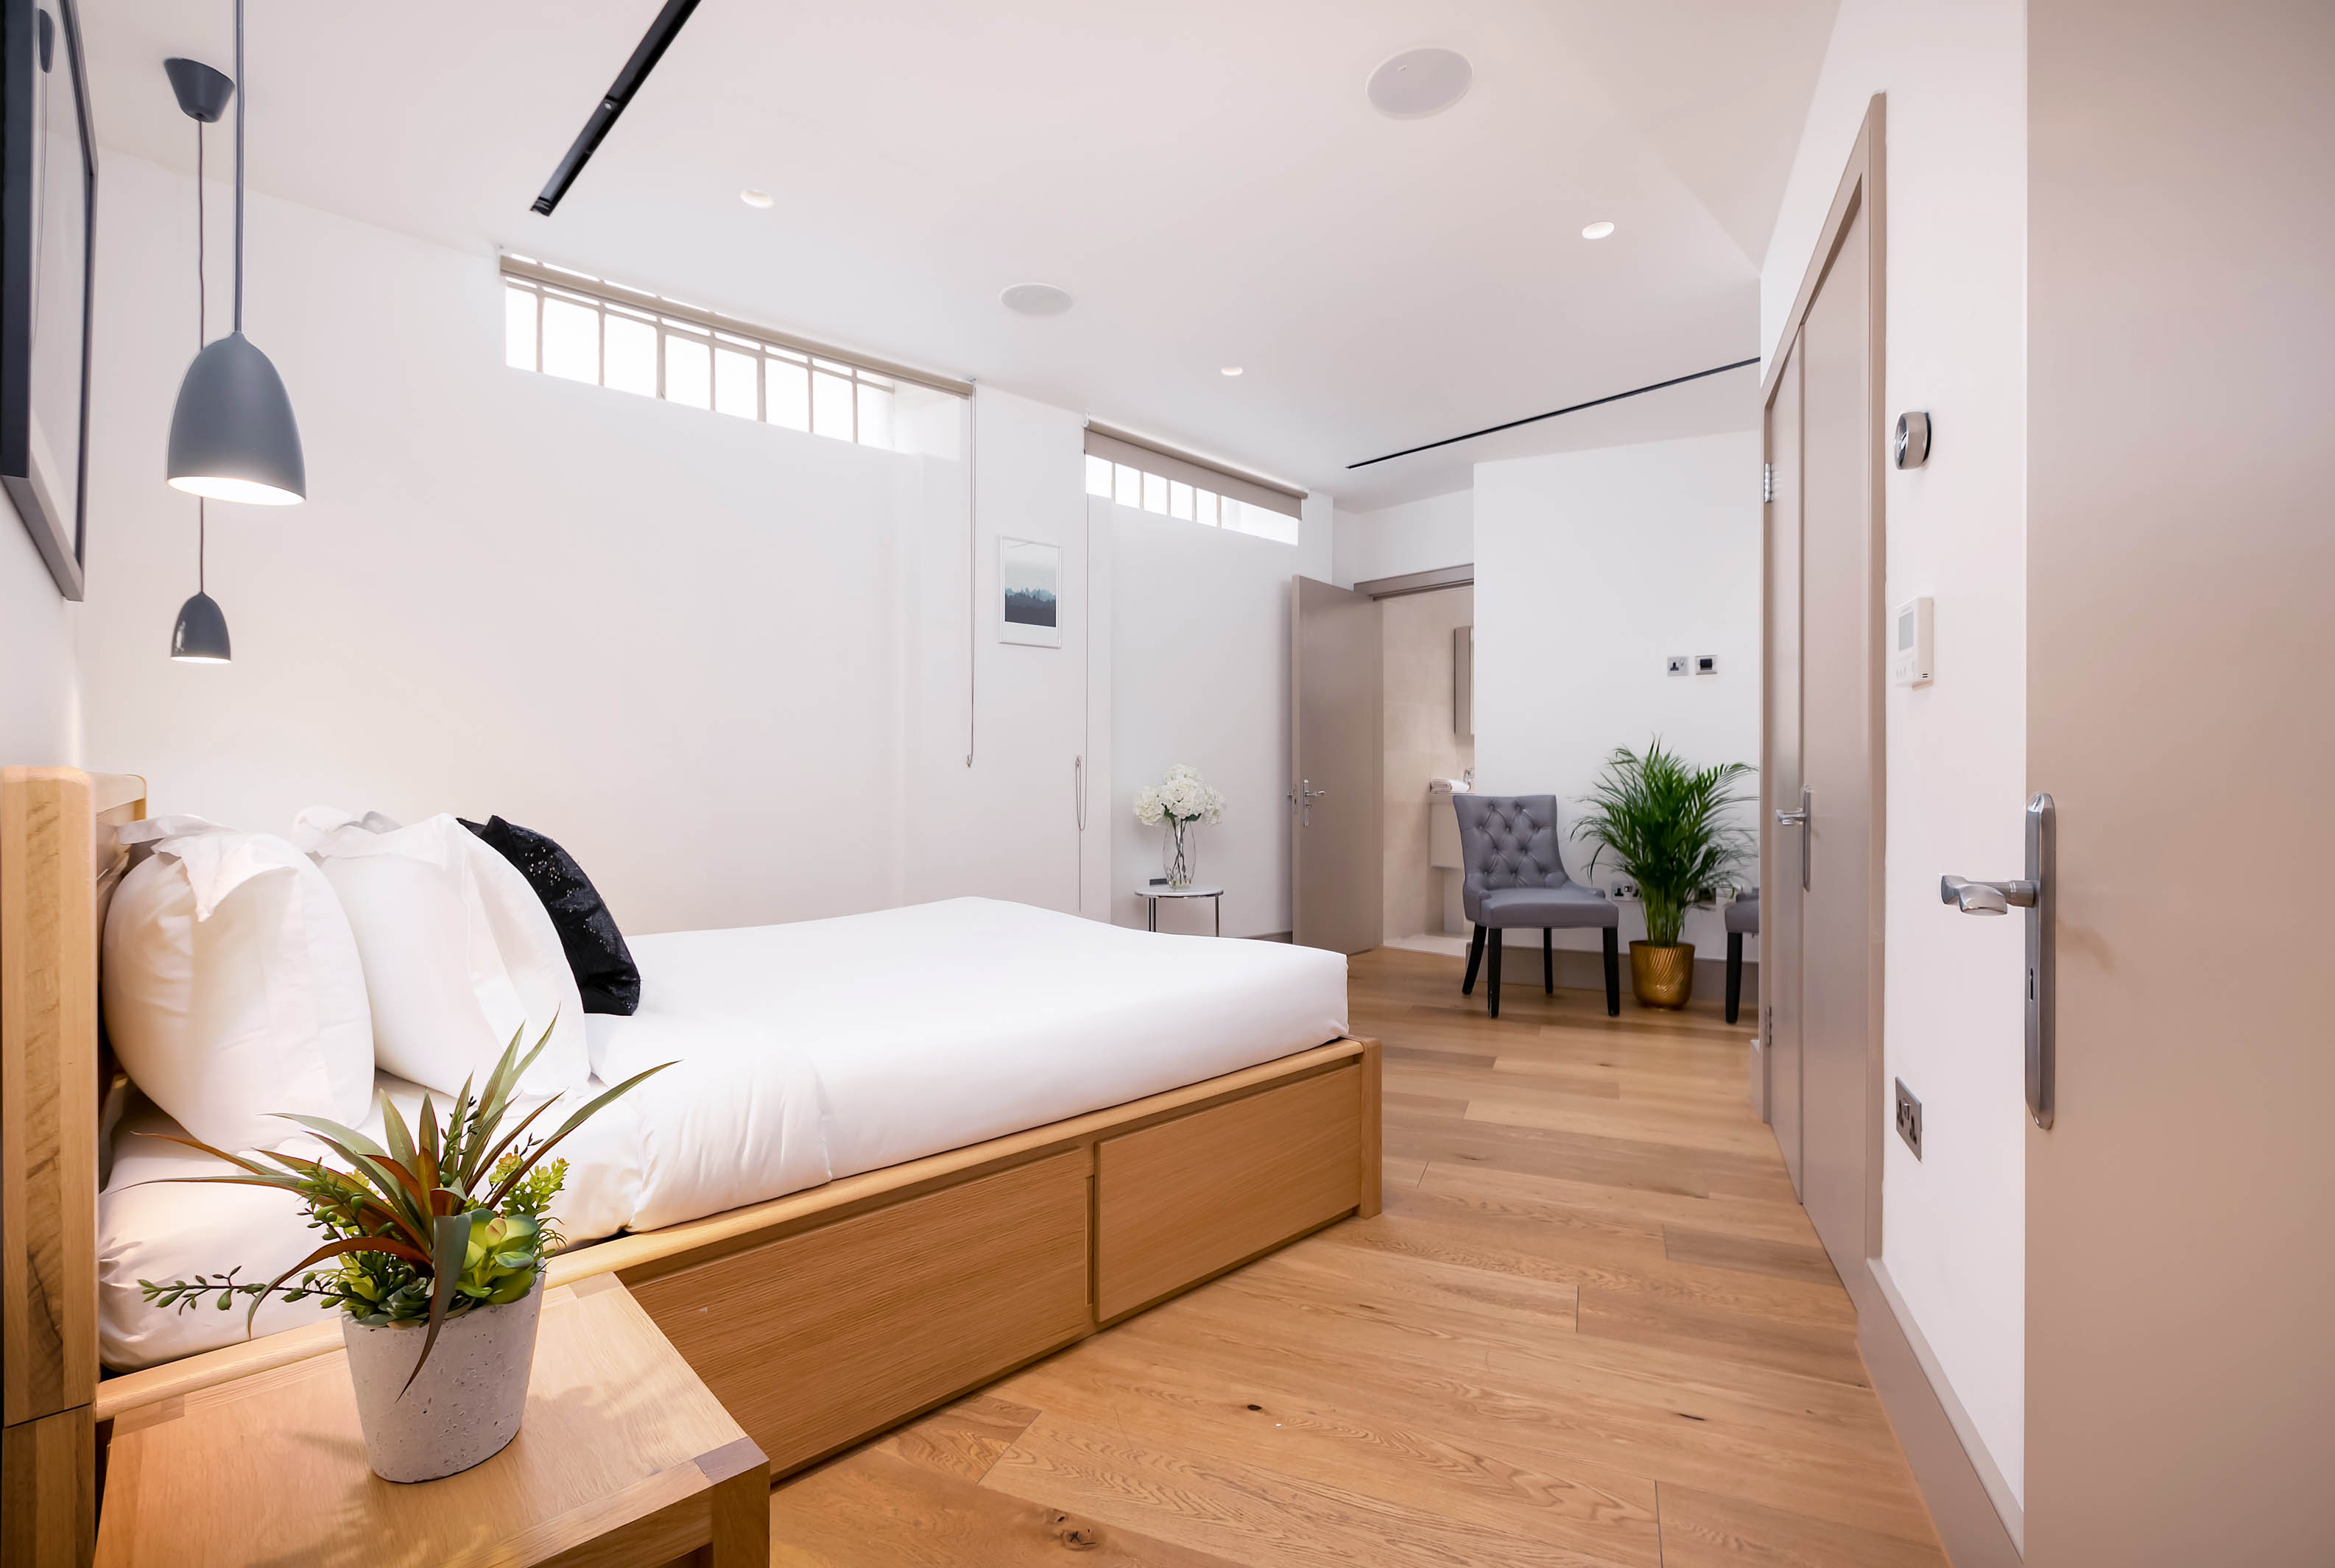 Lovelydays luxury service apartment rental - London - Fitzrovia - Wells Mews B - Lovelysuite - 2 bedrooms - 2 bathrooms - Double bed - 4a8874150cac - Lovelydays